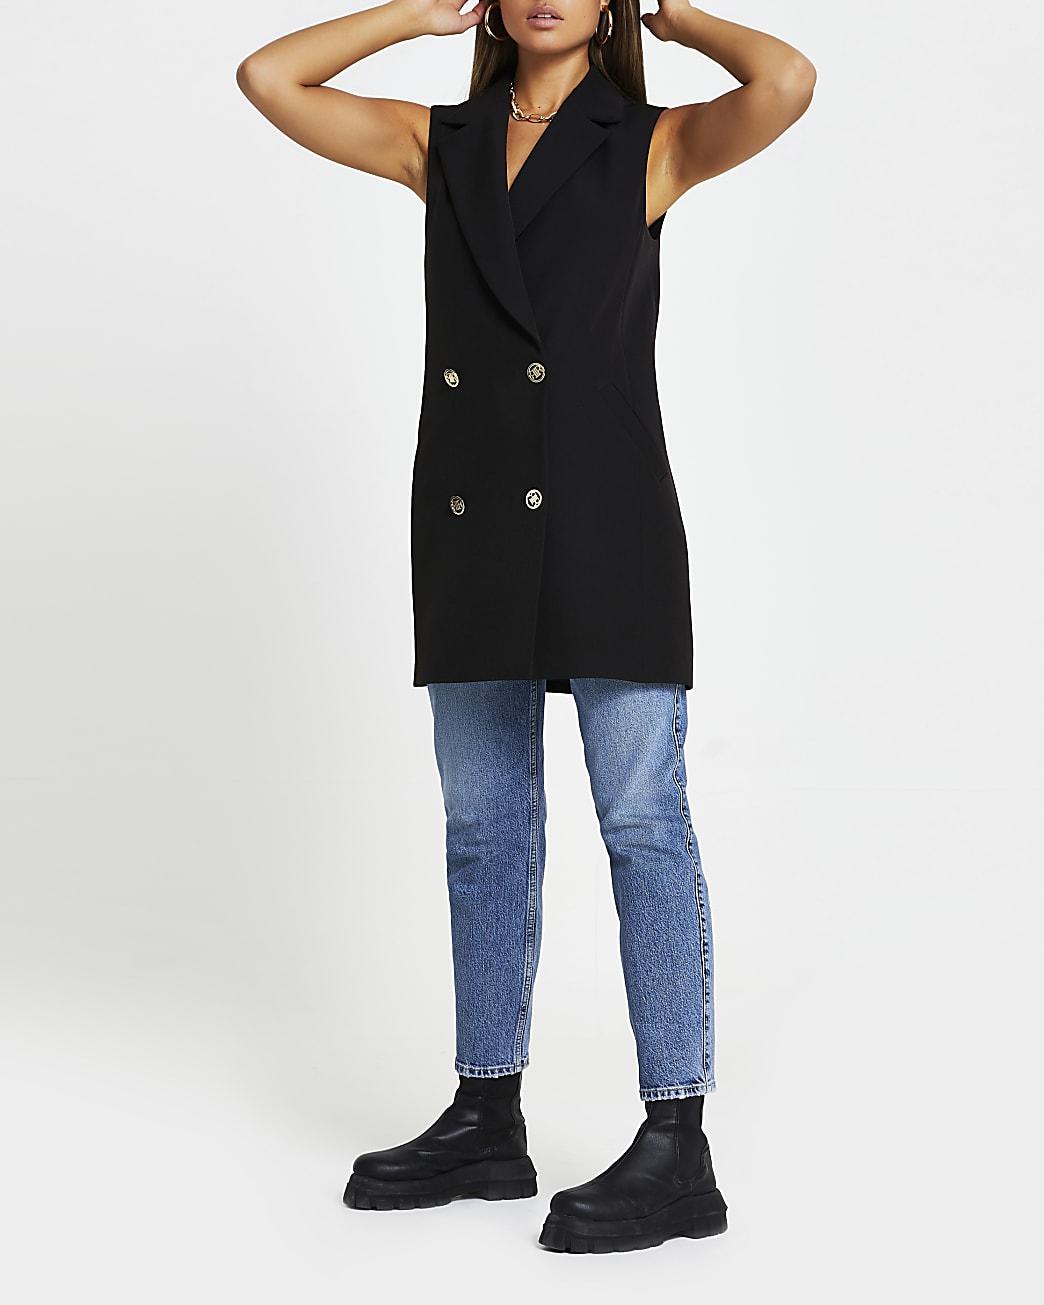 Black sleeveless blazer